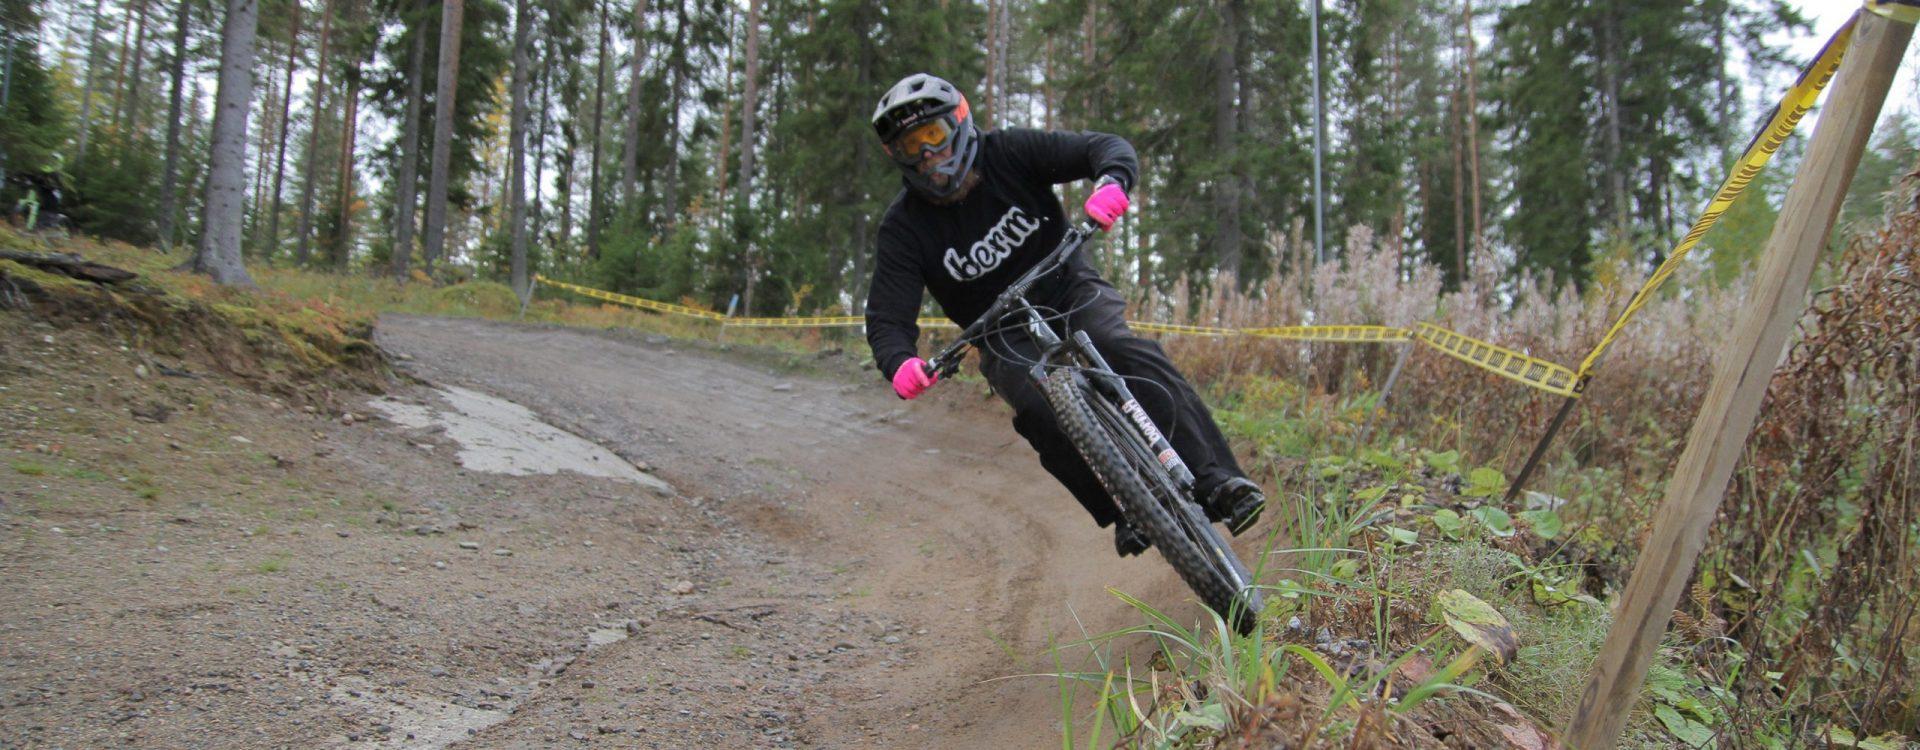 Maastopyöräilyvaatteet ja -varusteet | Berm.fi